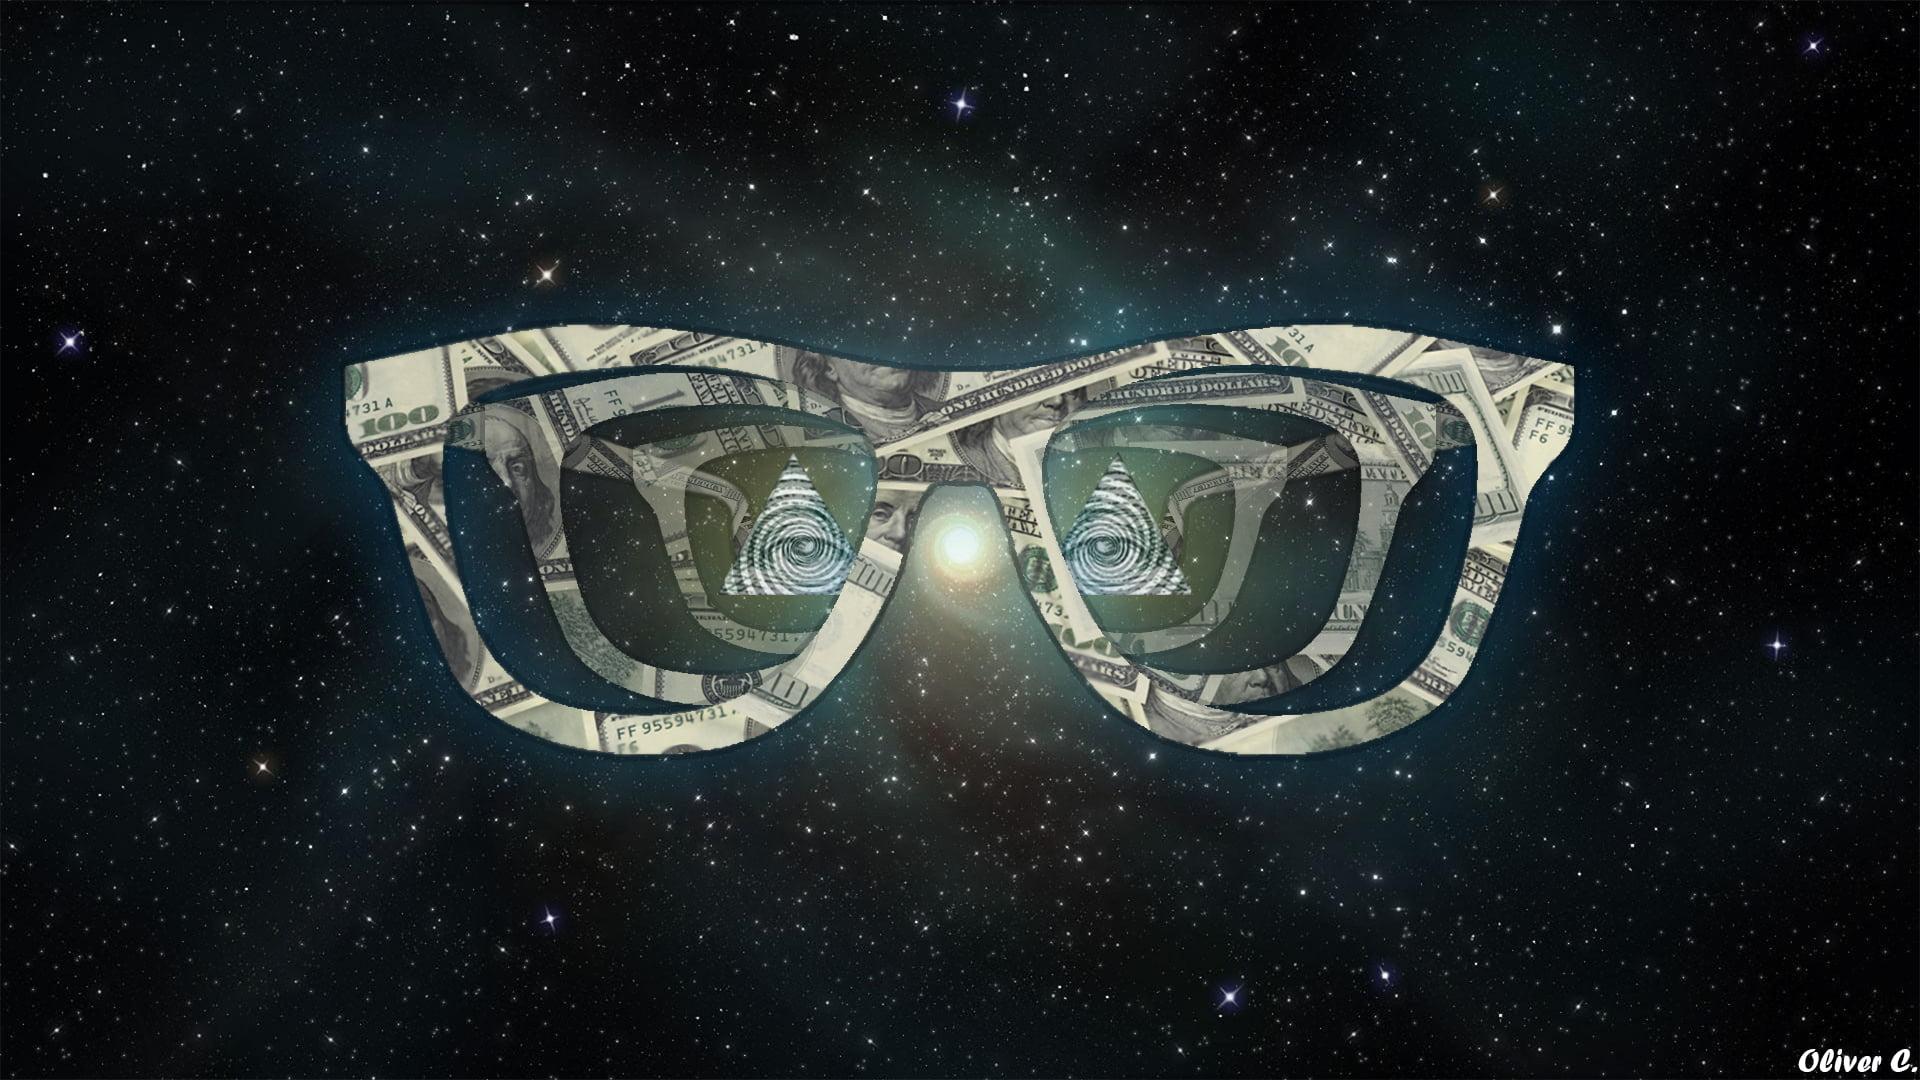 Illustration of eyeglasses and eye of providence nebula digital 1920x1080